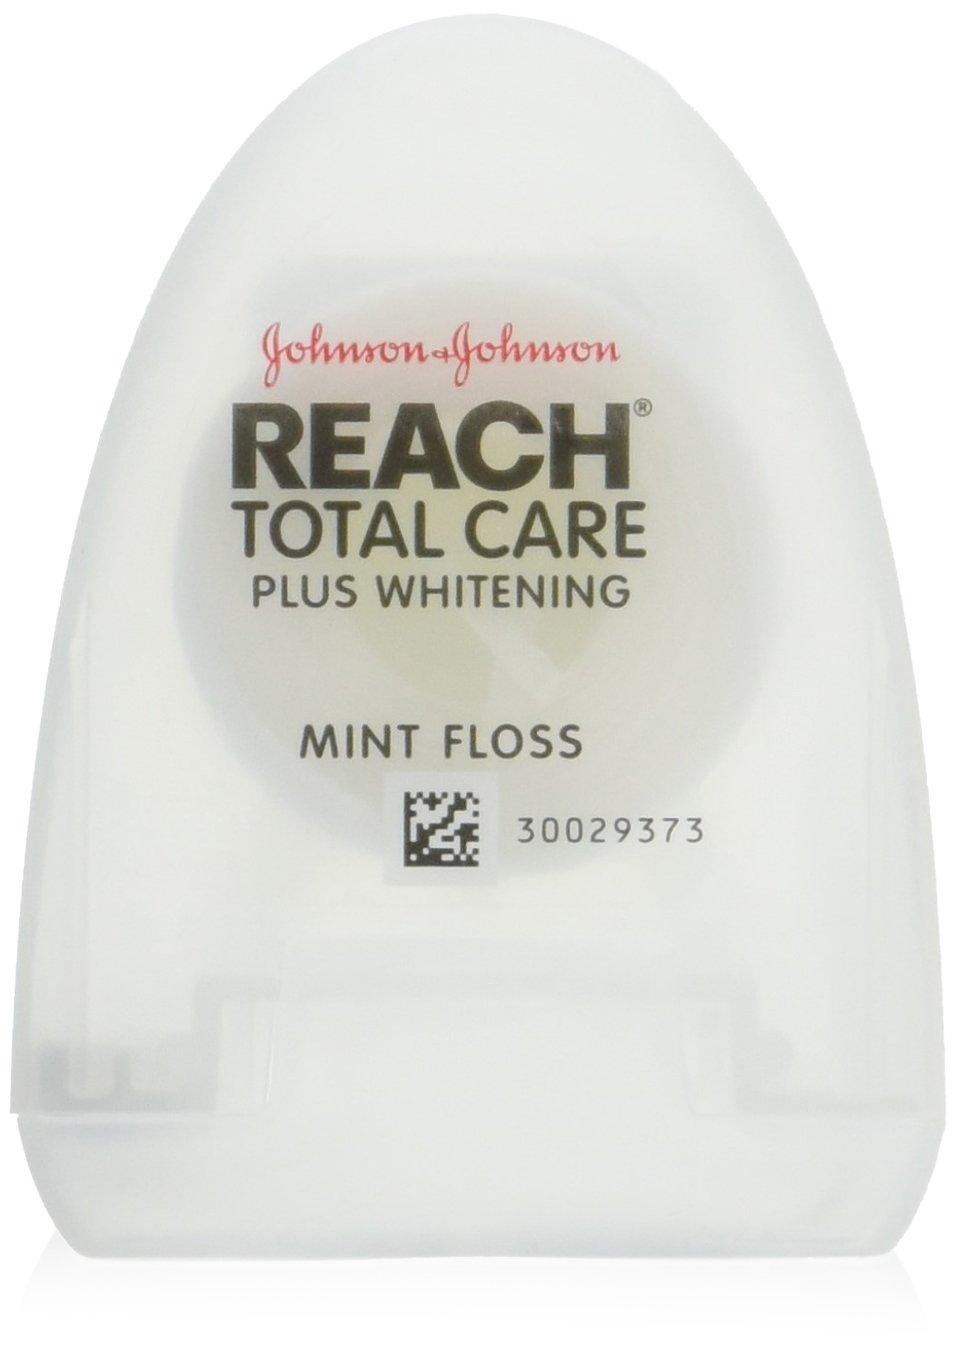 Reach Total Care Dental Floss Plus Whitening (4 Pack)